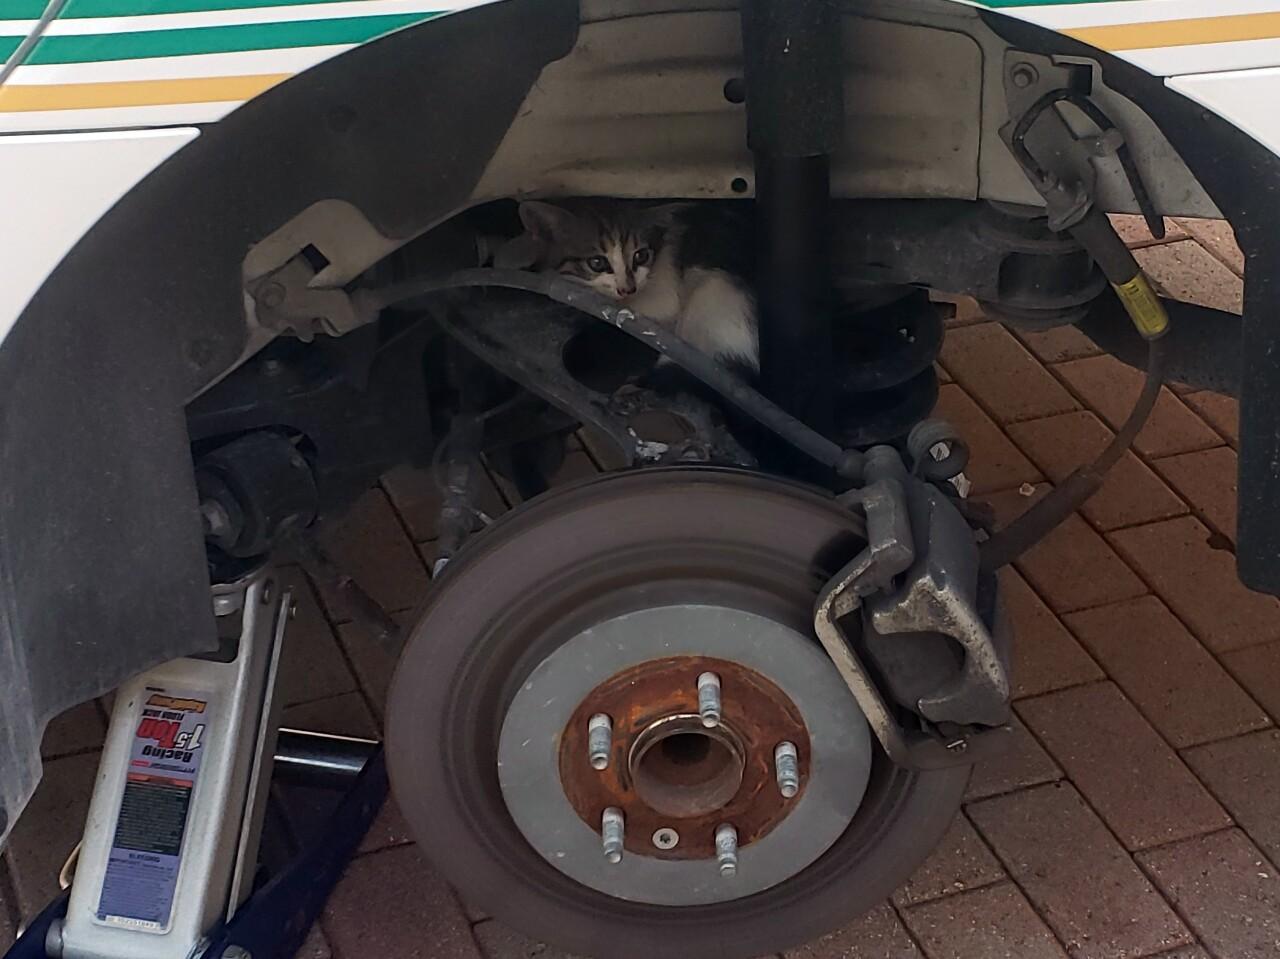 tire removed from rear of Florida Keys deputy's patrol car where kitten was hiding